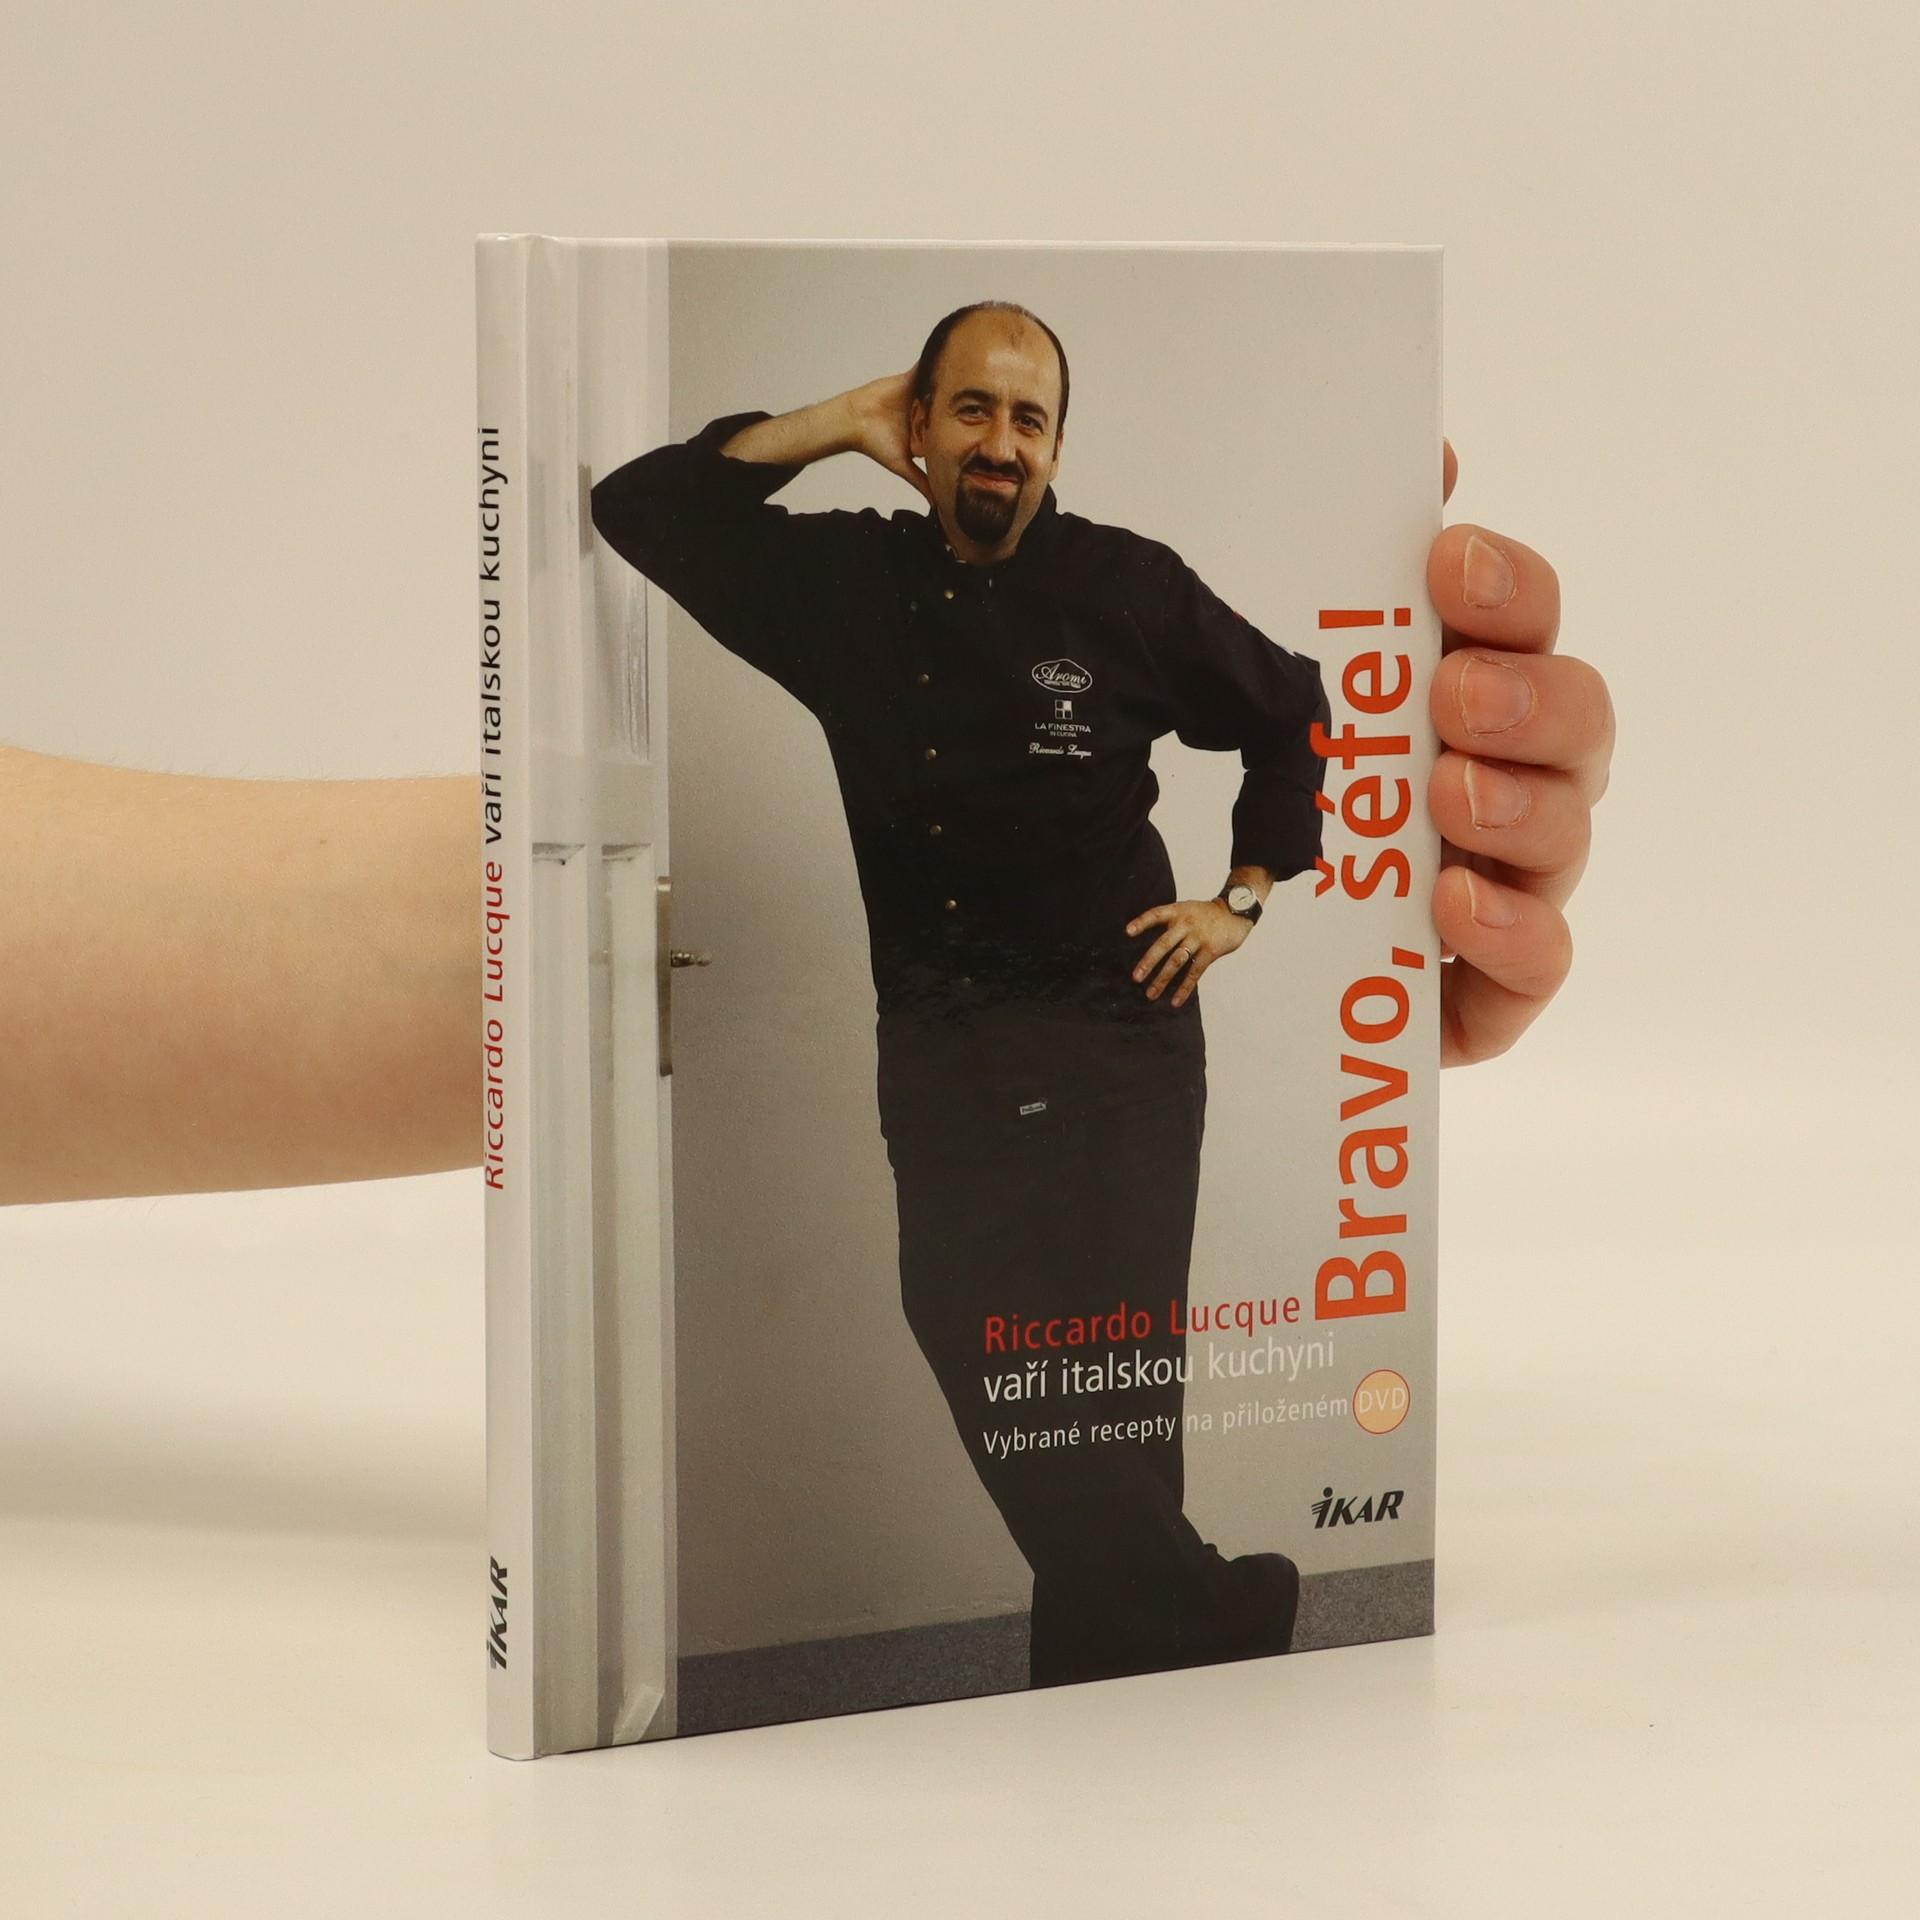 antikvární kniha Bravo, šéfe! Riccardo Lucque vaří italskou kuchyni , 2009